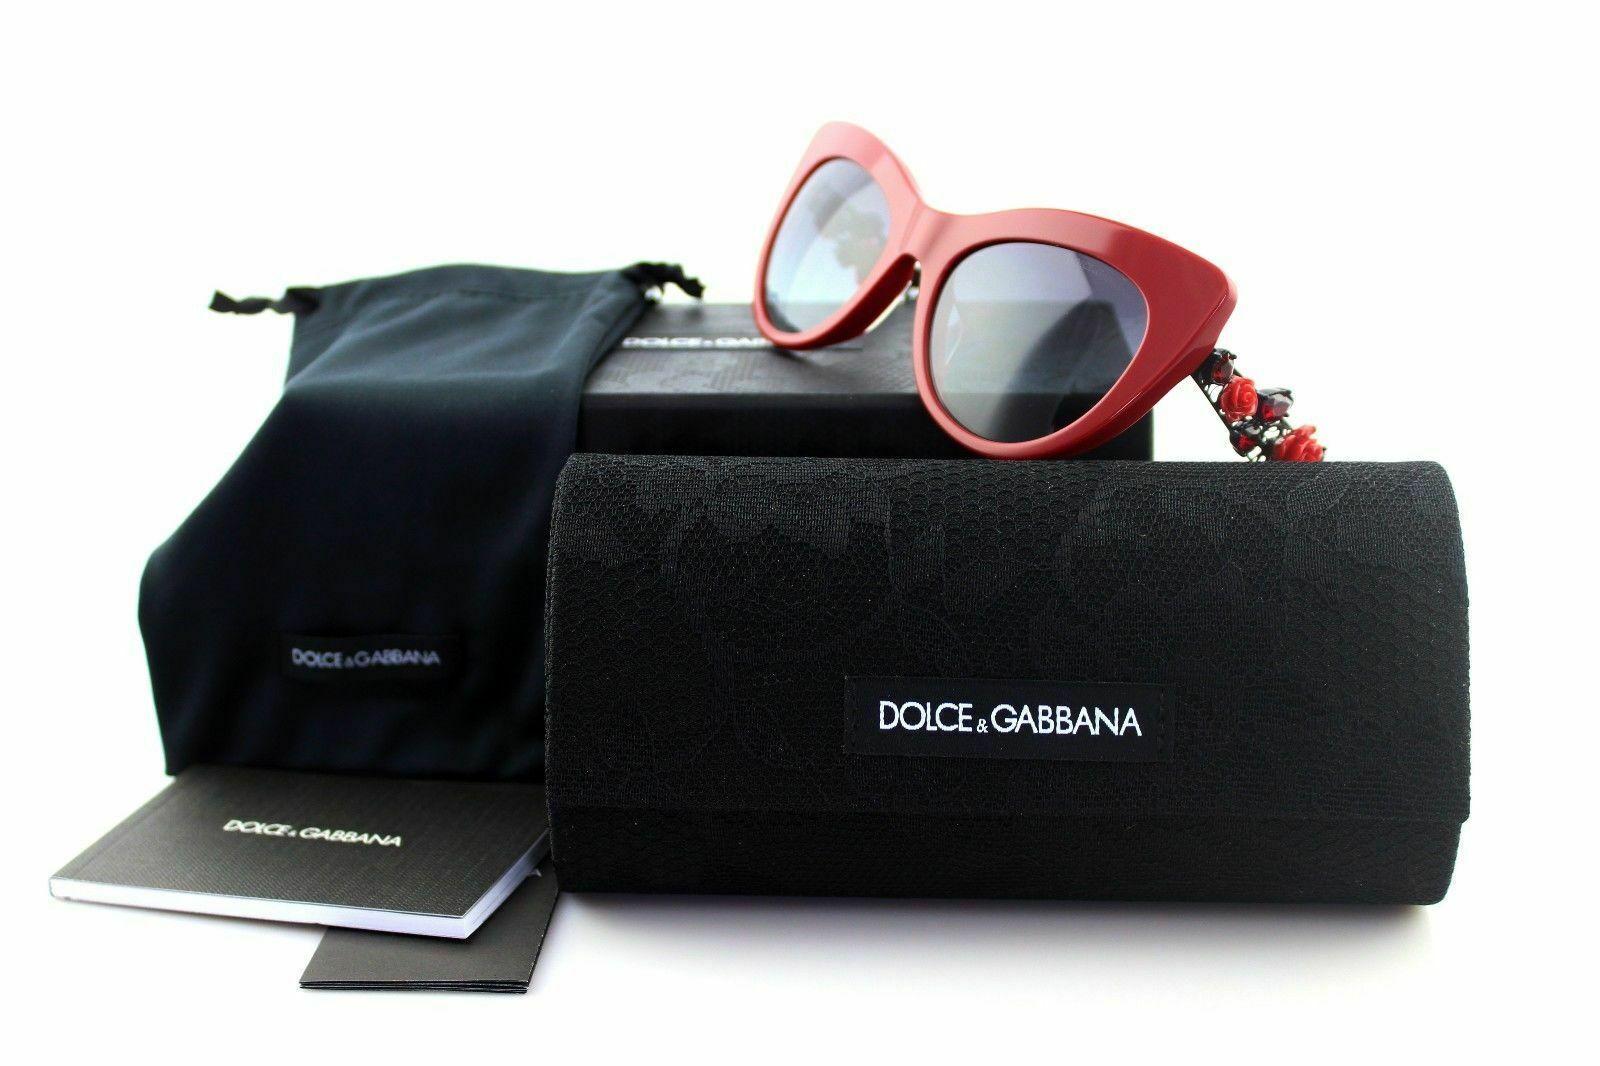 Dolce & Gabbana Metal FLOWER LACE Red Ruthenium Cat Eye Sunglasses DG4302B